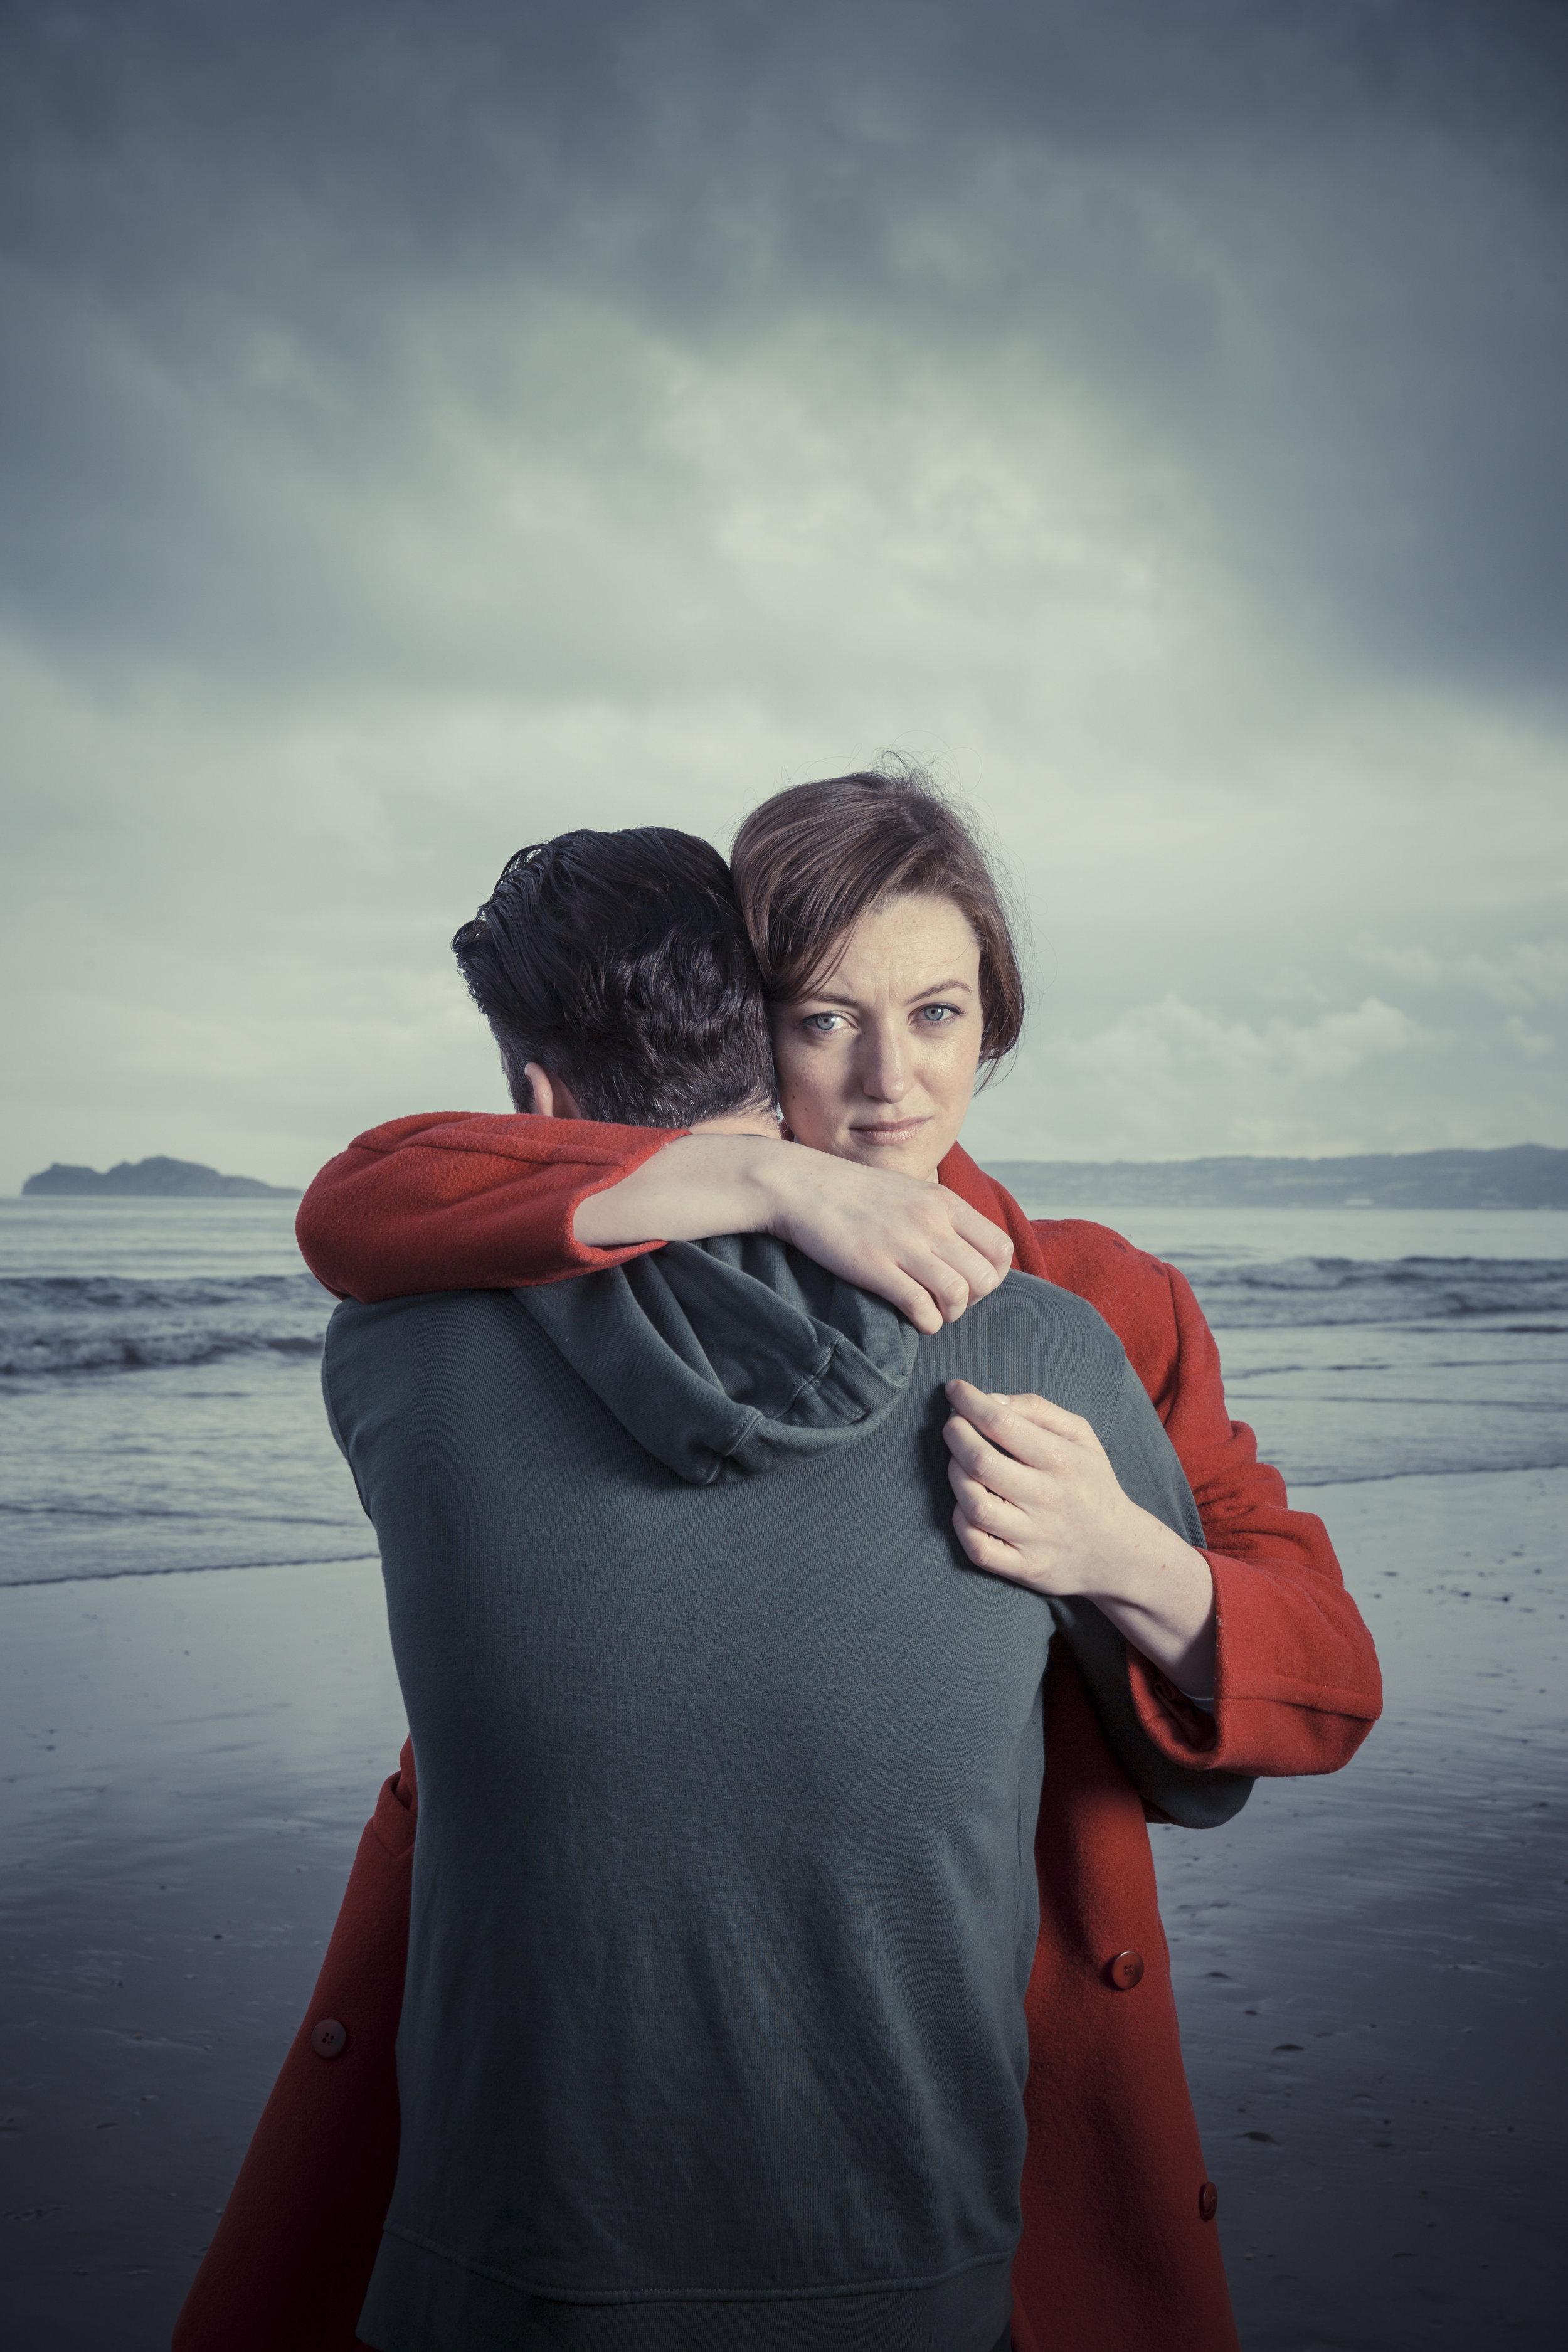 Liam Heslin and Rachel O'Byrne. Photo by Ste Murray.